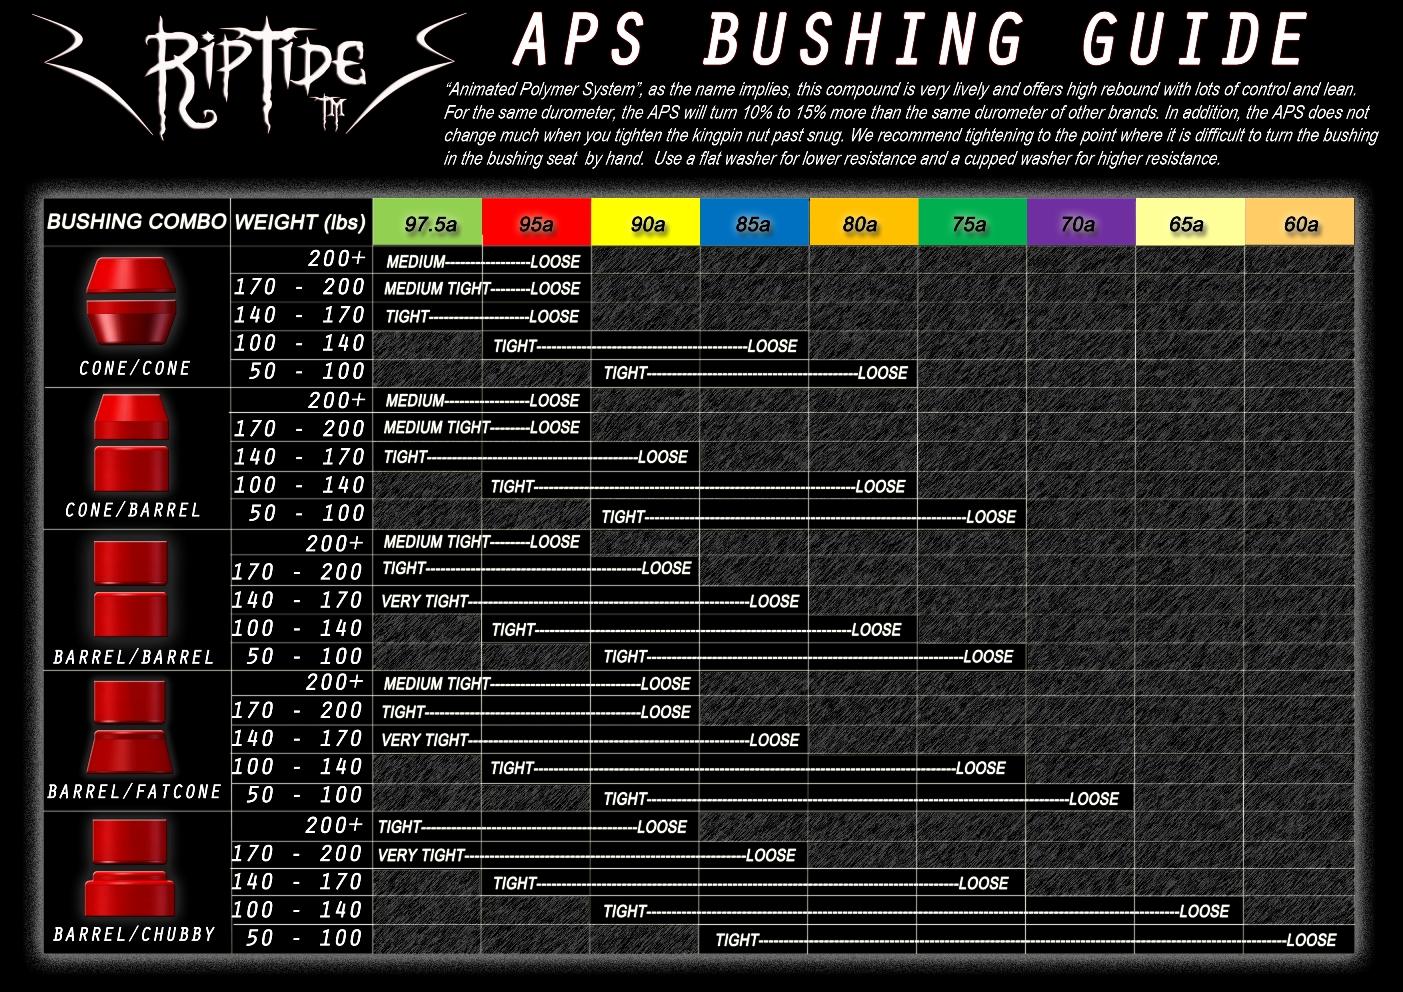 riptide-bushings-aps-bushing-weight-chart-in-lbs-i.jpg